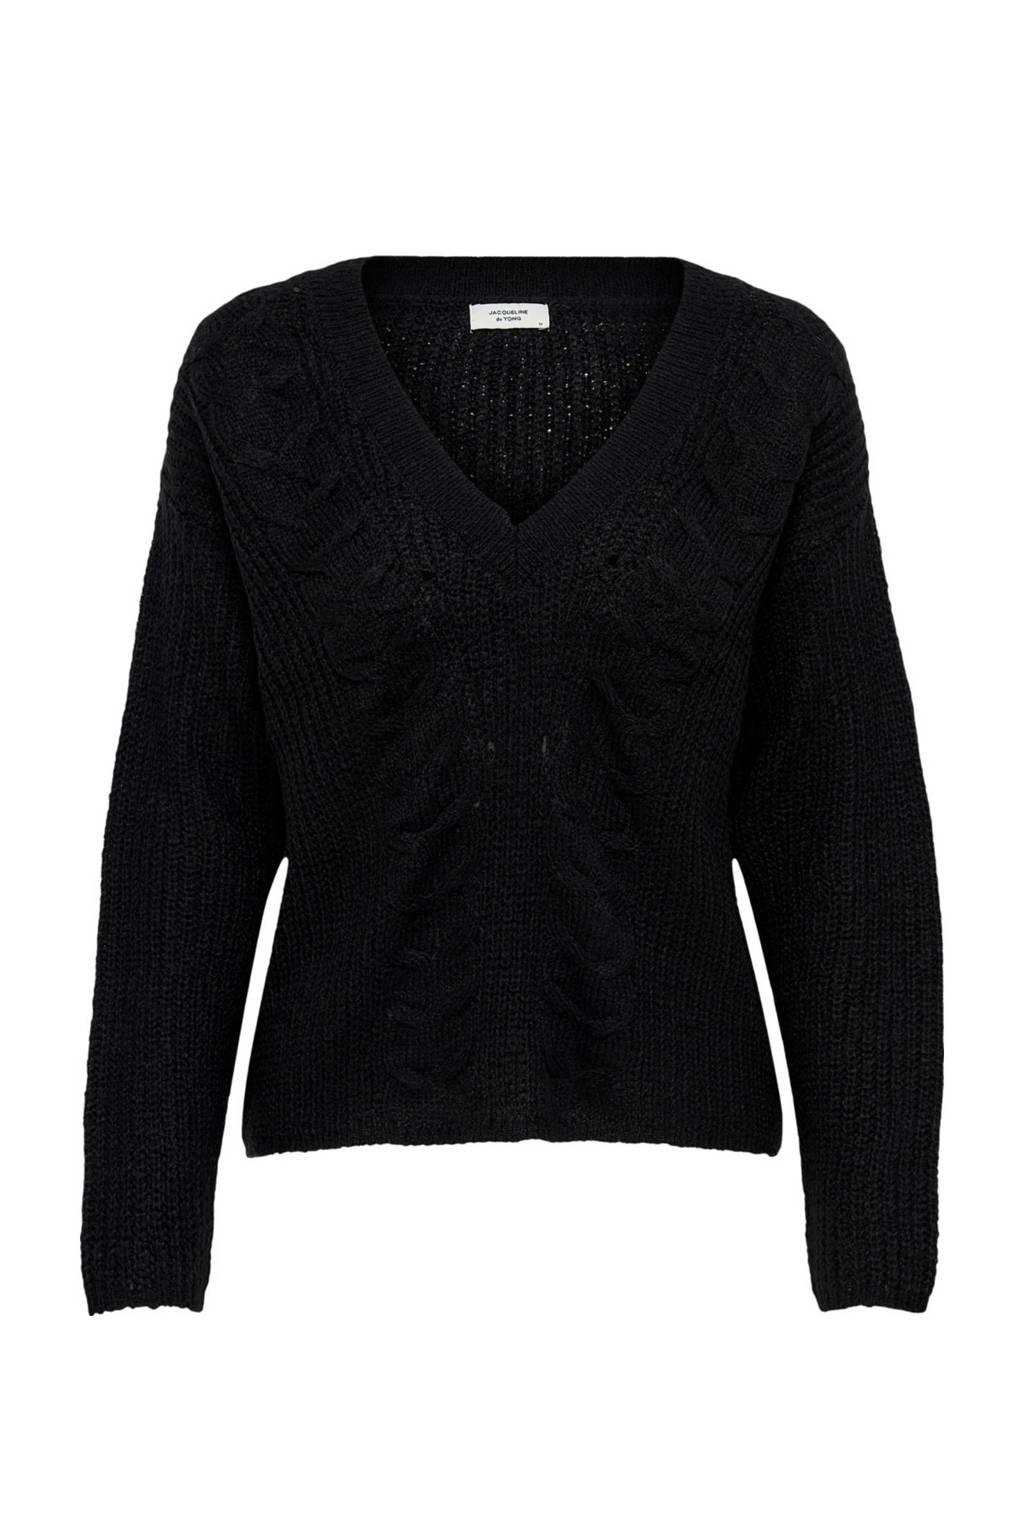 JACQUELINE DE YONG trui Miella zwart, Zwart